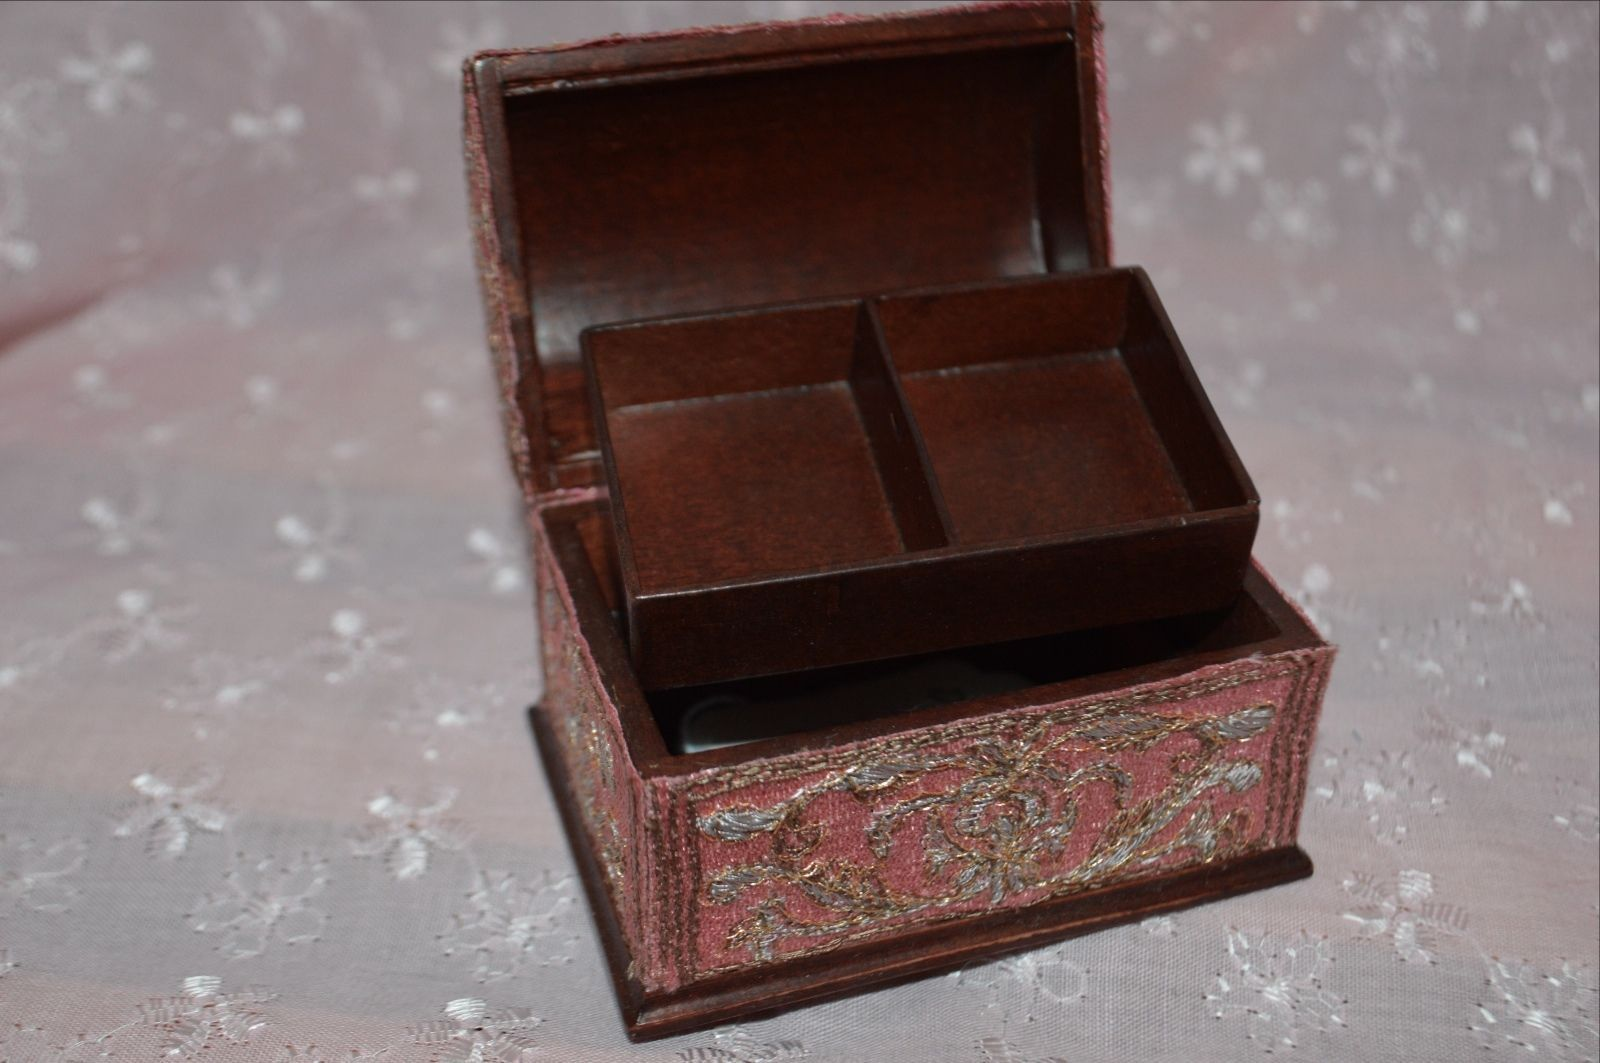 Doll House Bespaq Rare Wood & Cloth Dolls House Travel Trunk MUST SEE | eBay